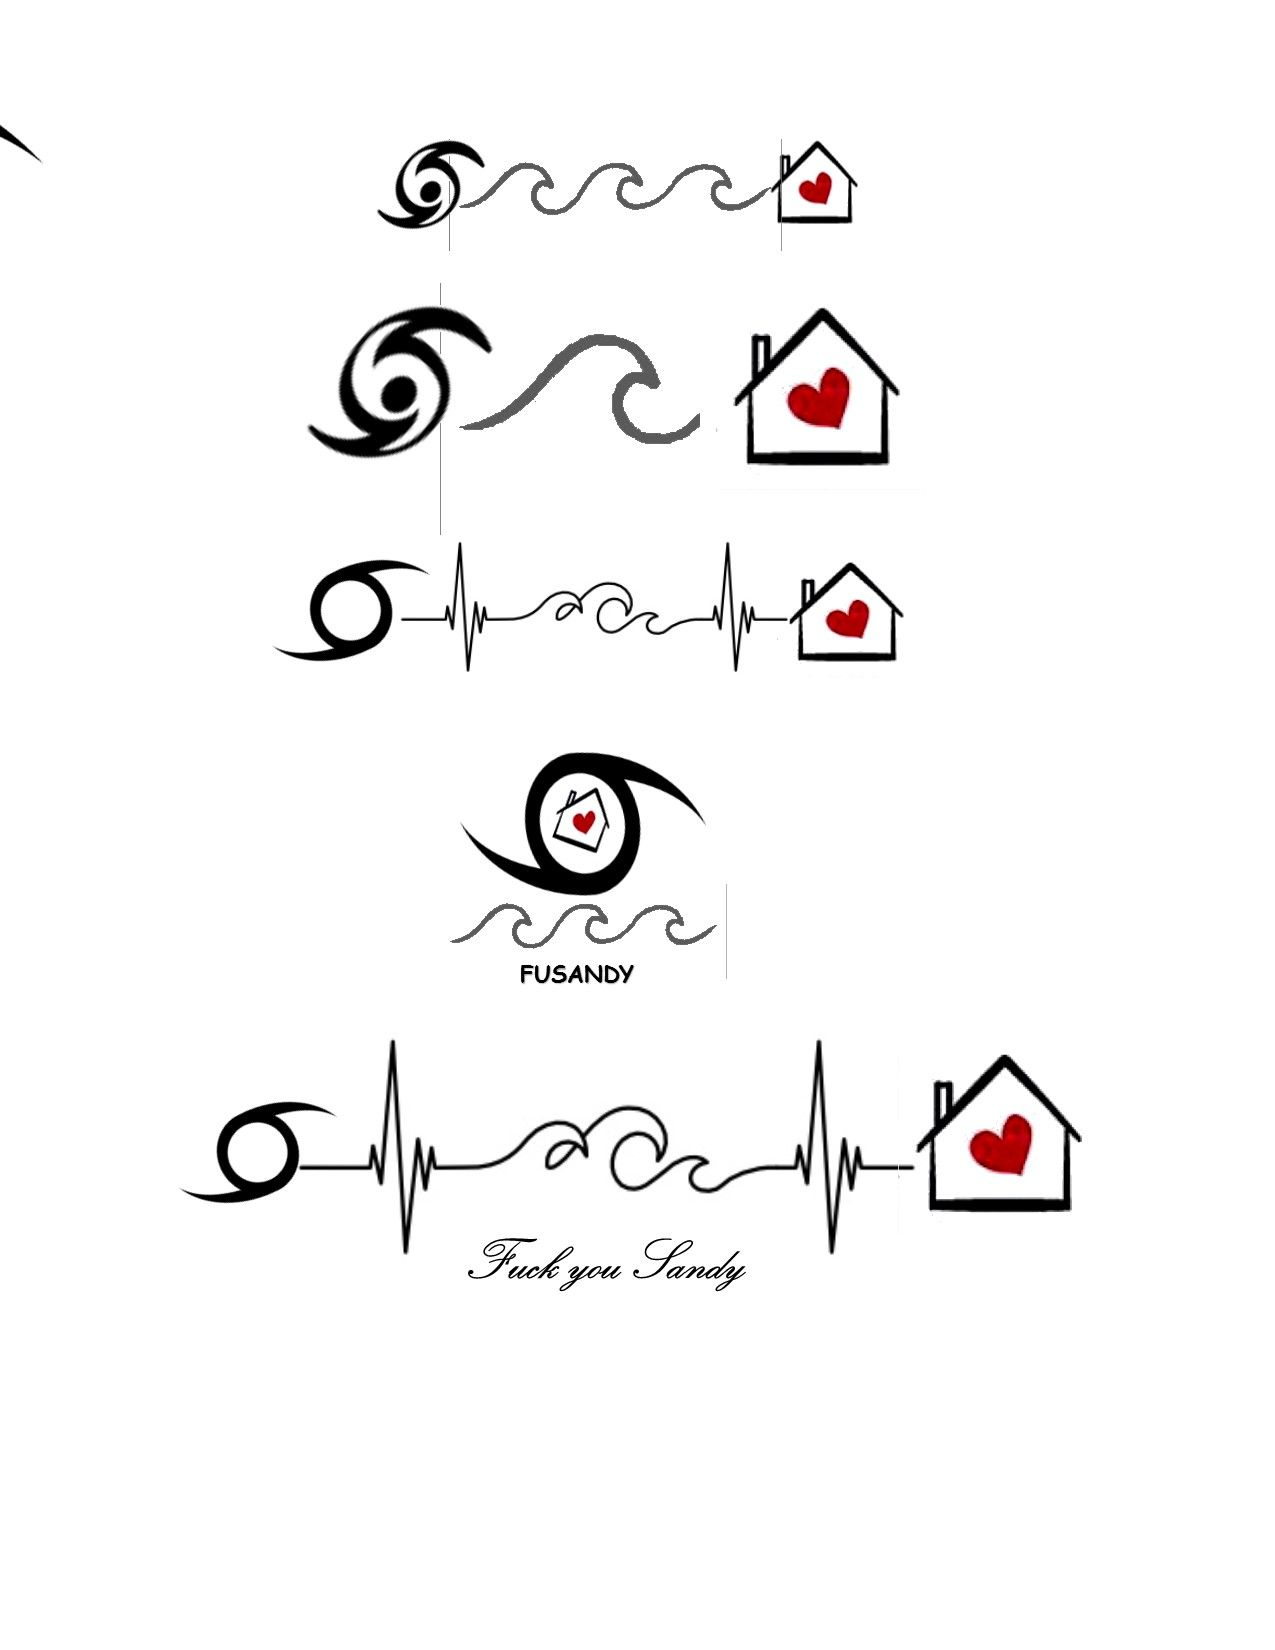 Custom Hurricane Tattoo Ideas Hurricanesandy Fusandy Inkideas Hearthome Waves Heartbeats Hurricane Tattoo I Tattoo Tattoos